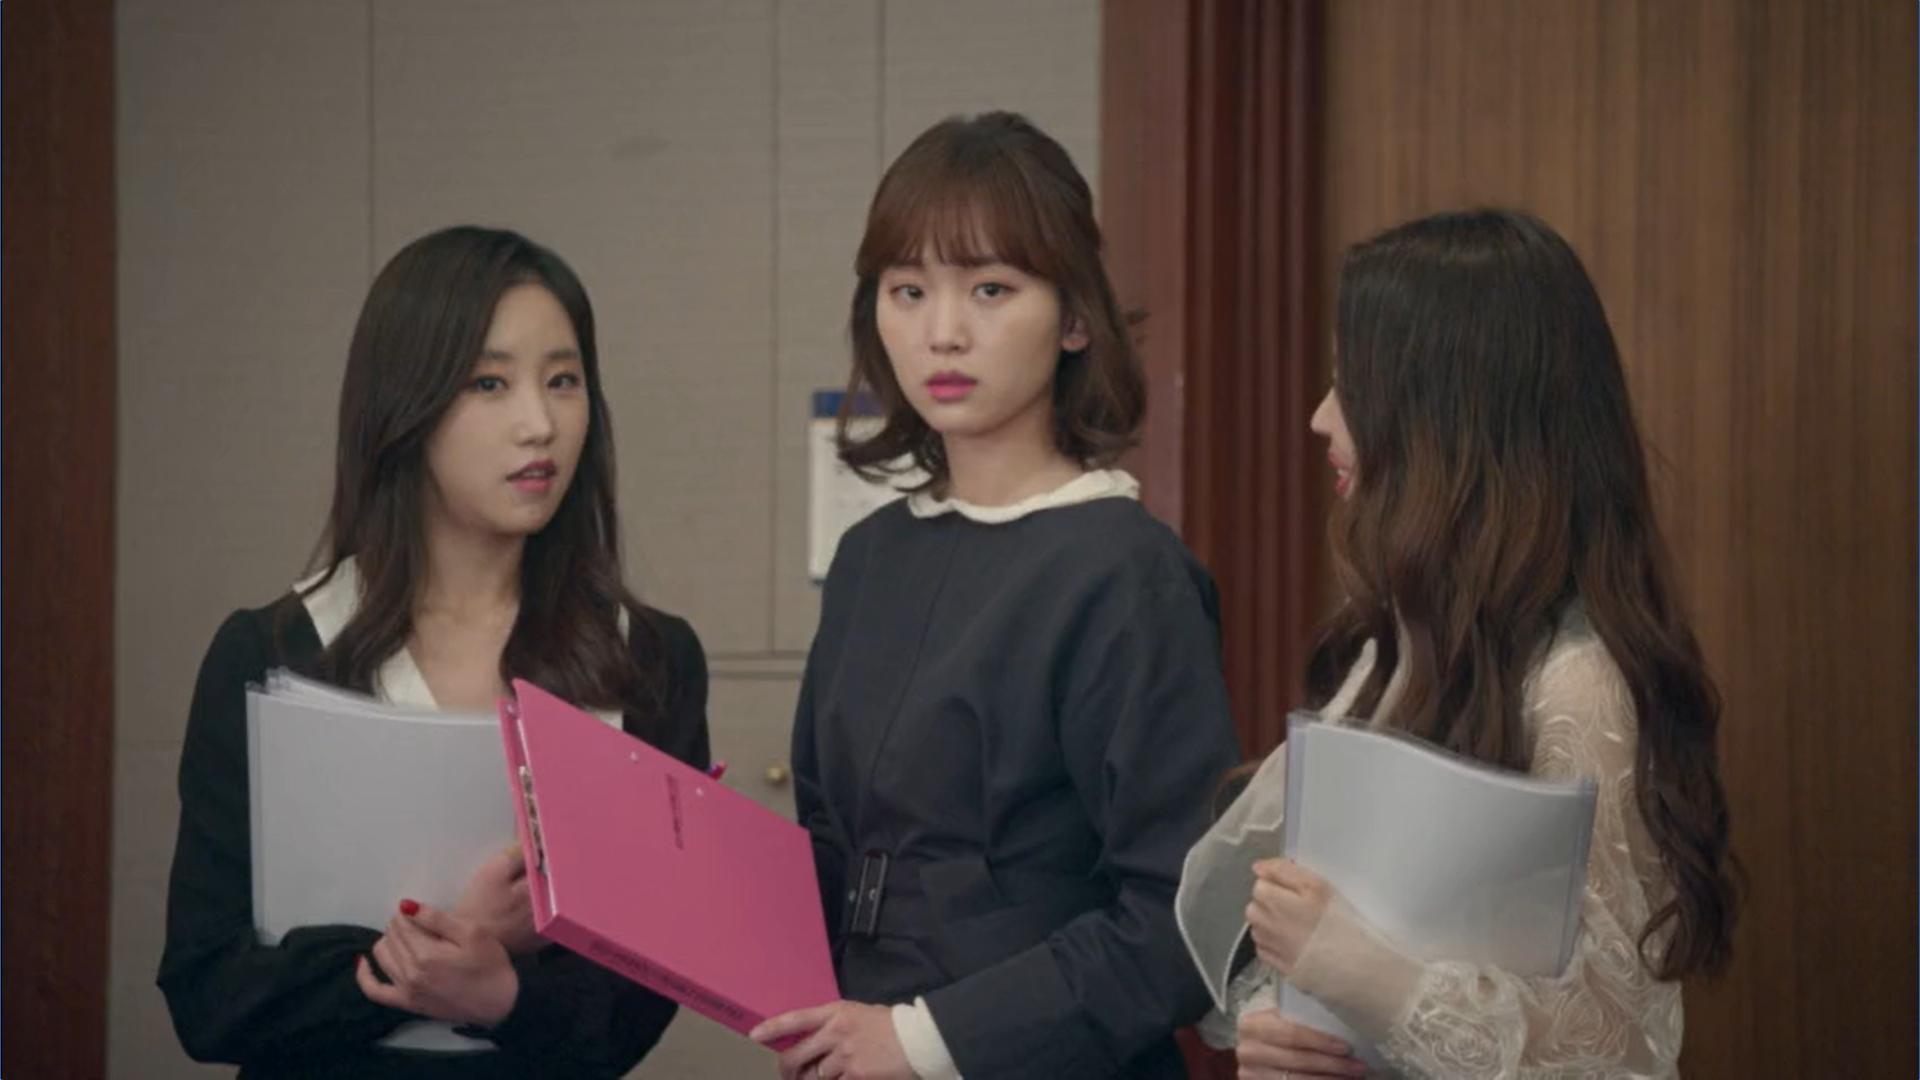 Wednesday 3:30 PM Seon Eun-woo looking at Yoon Jae-won